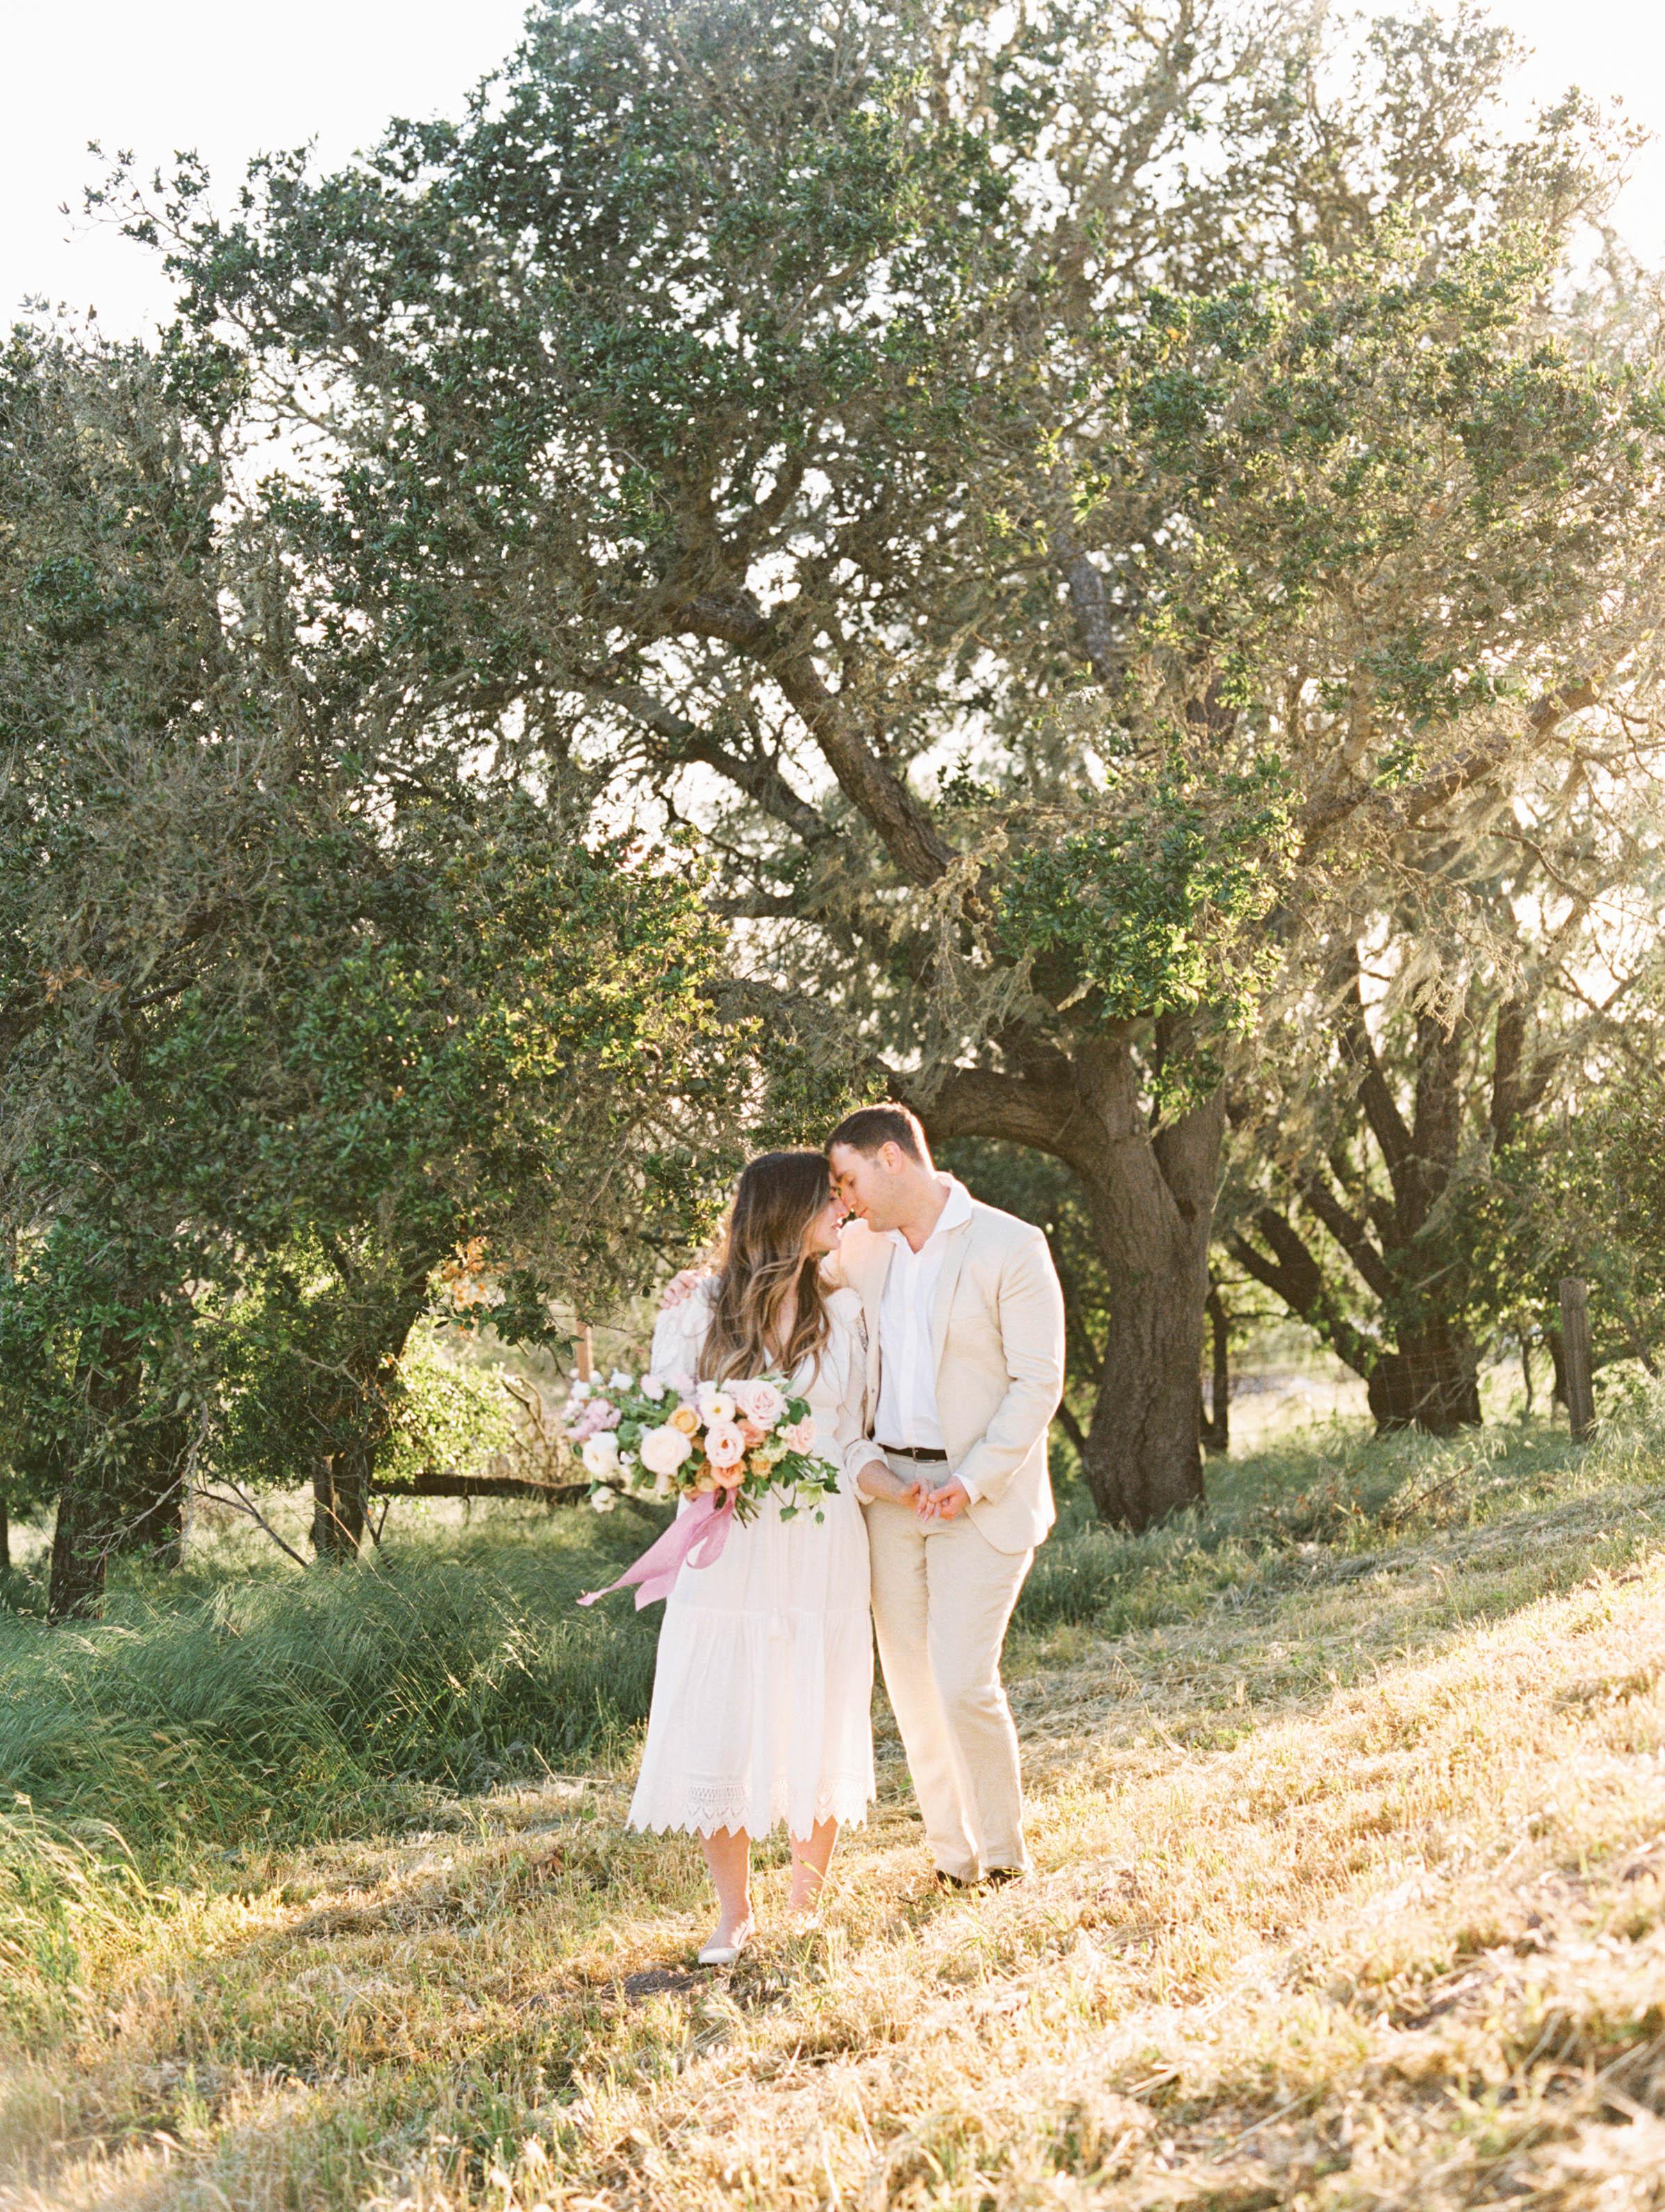 kelsandmichael_wedding_lieffranch-307.jpg